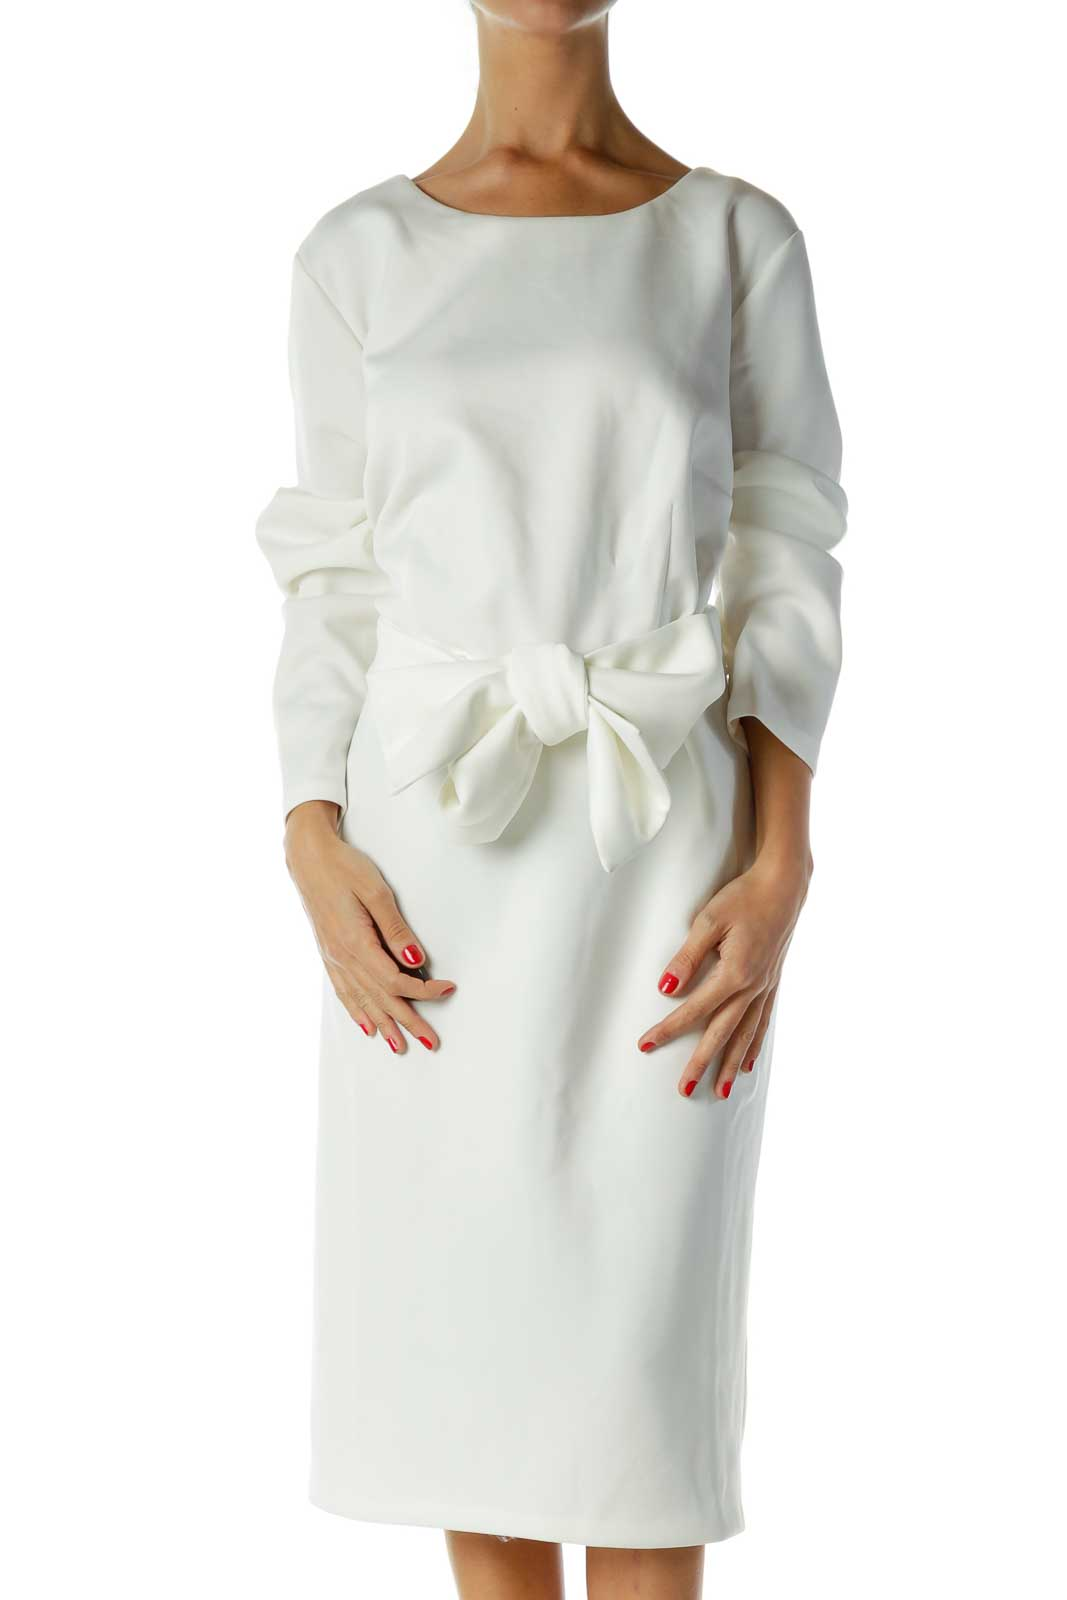 Cream Shift Dress Front